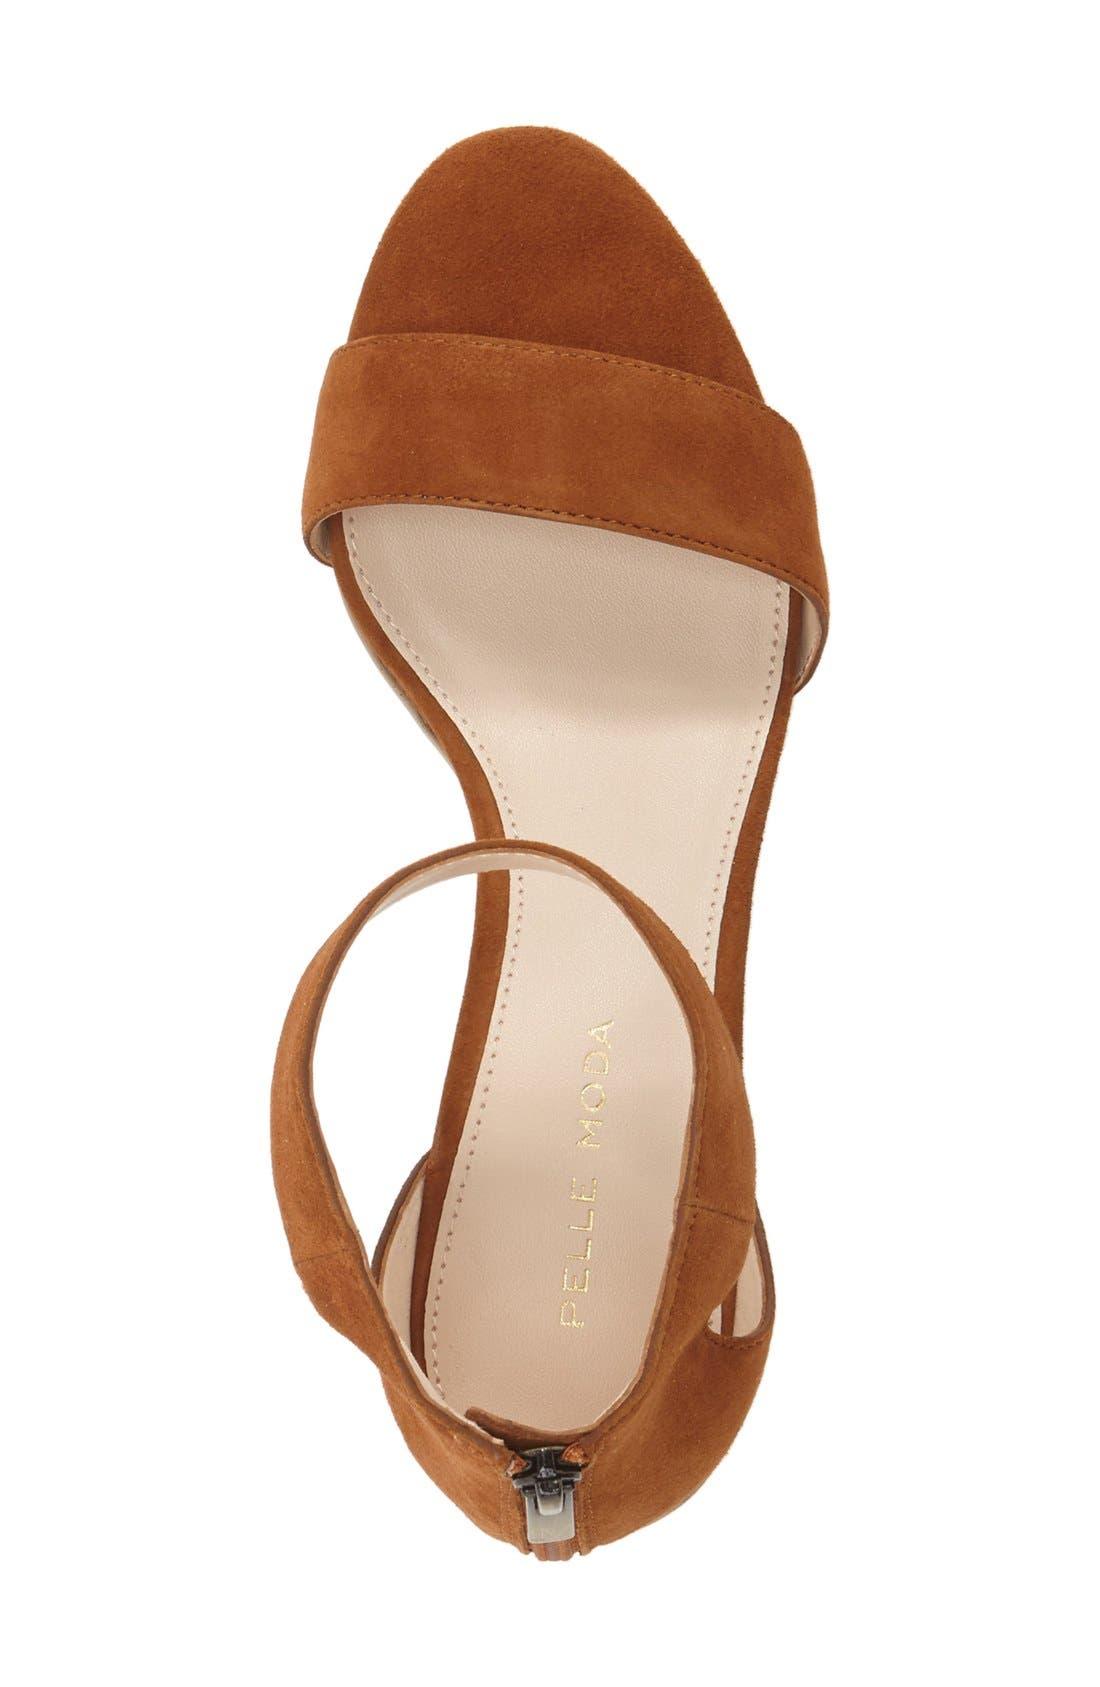 Pella Moda 'Urban' Block Heel Sandal,                             Alternate thumbnail 8, color,